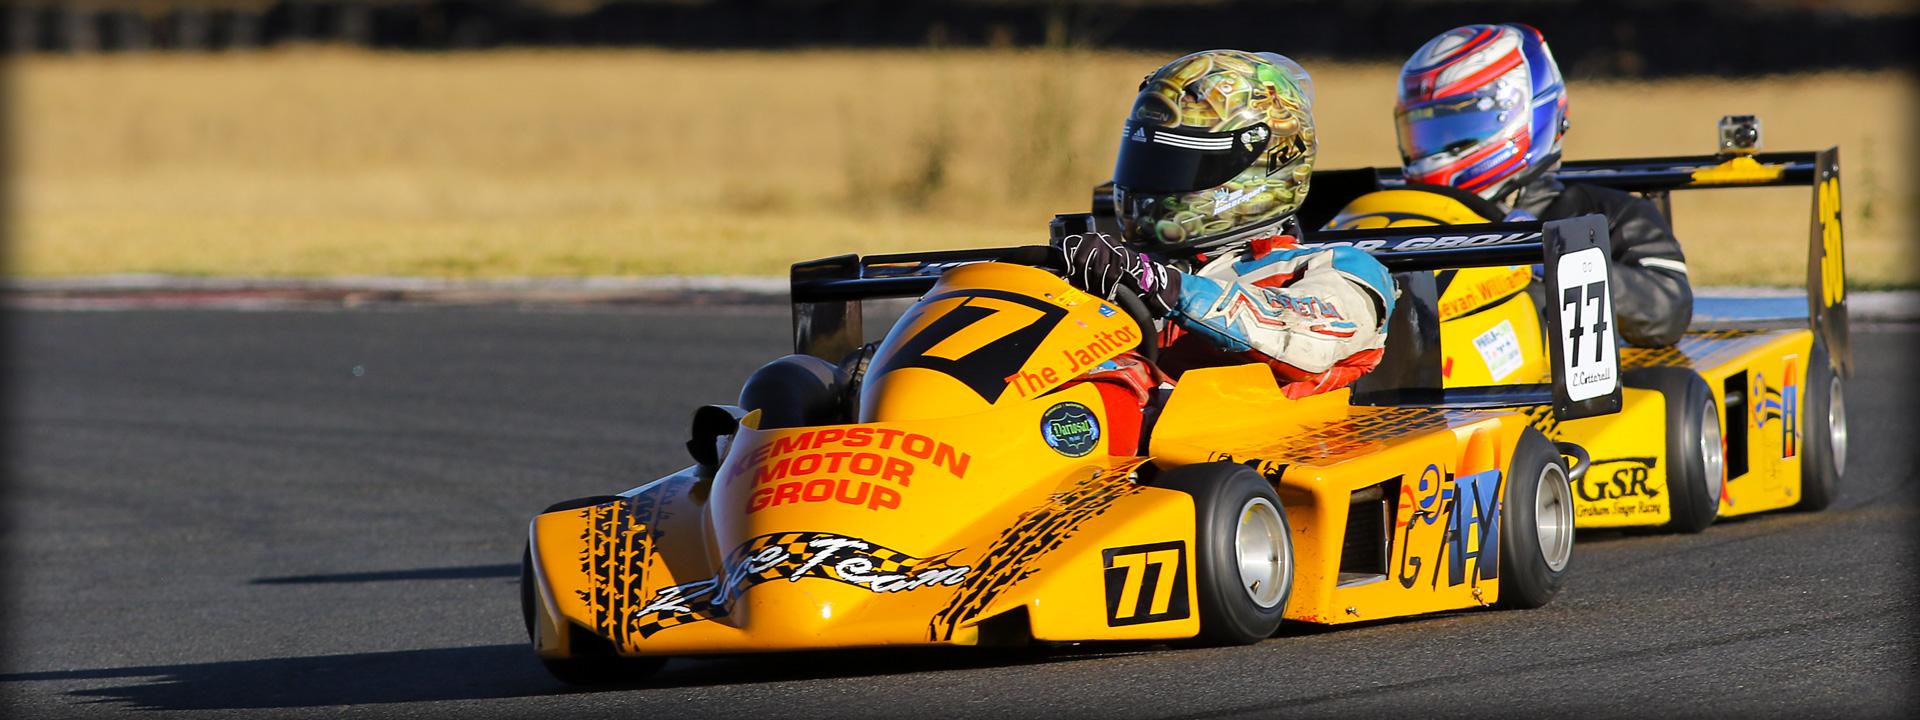 Inland Championship - Round 6 - Red Star Raceway - 2016-08-13 - Photographs